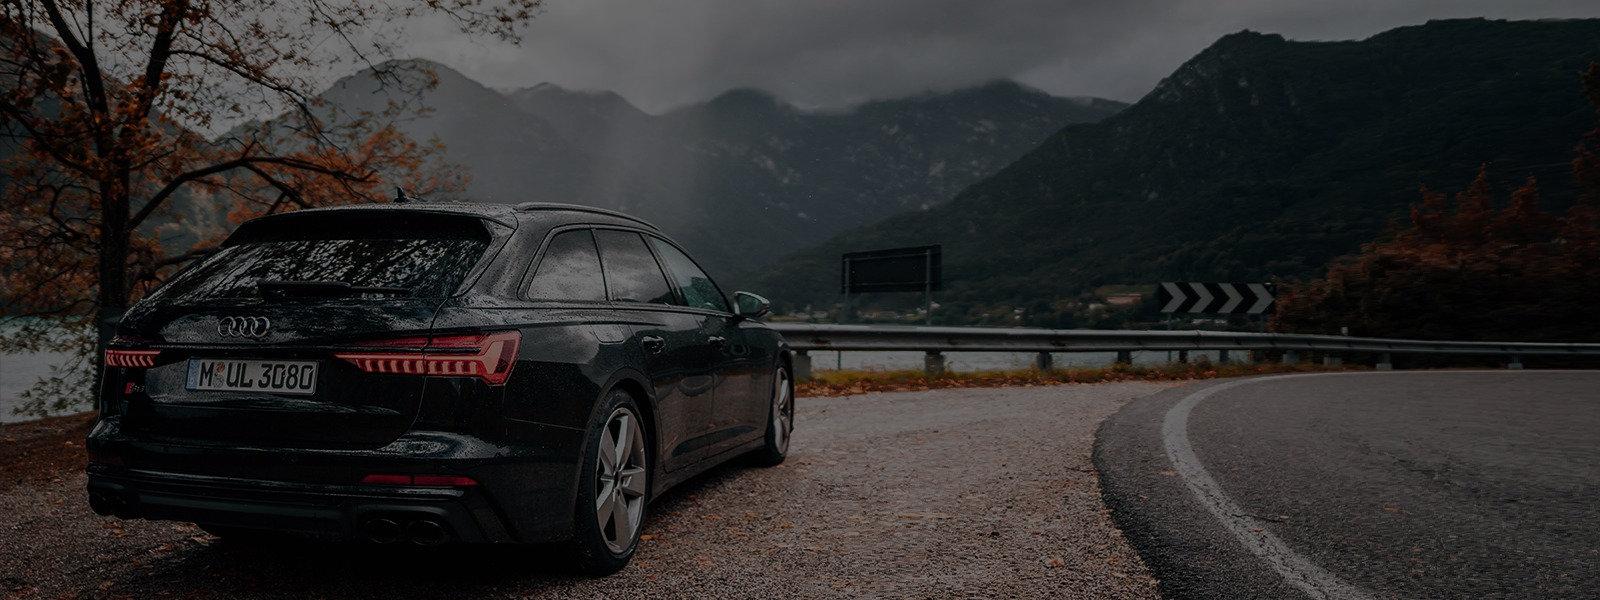 Audi_edited.jpg